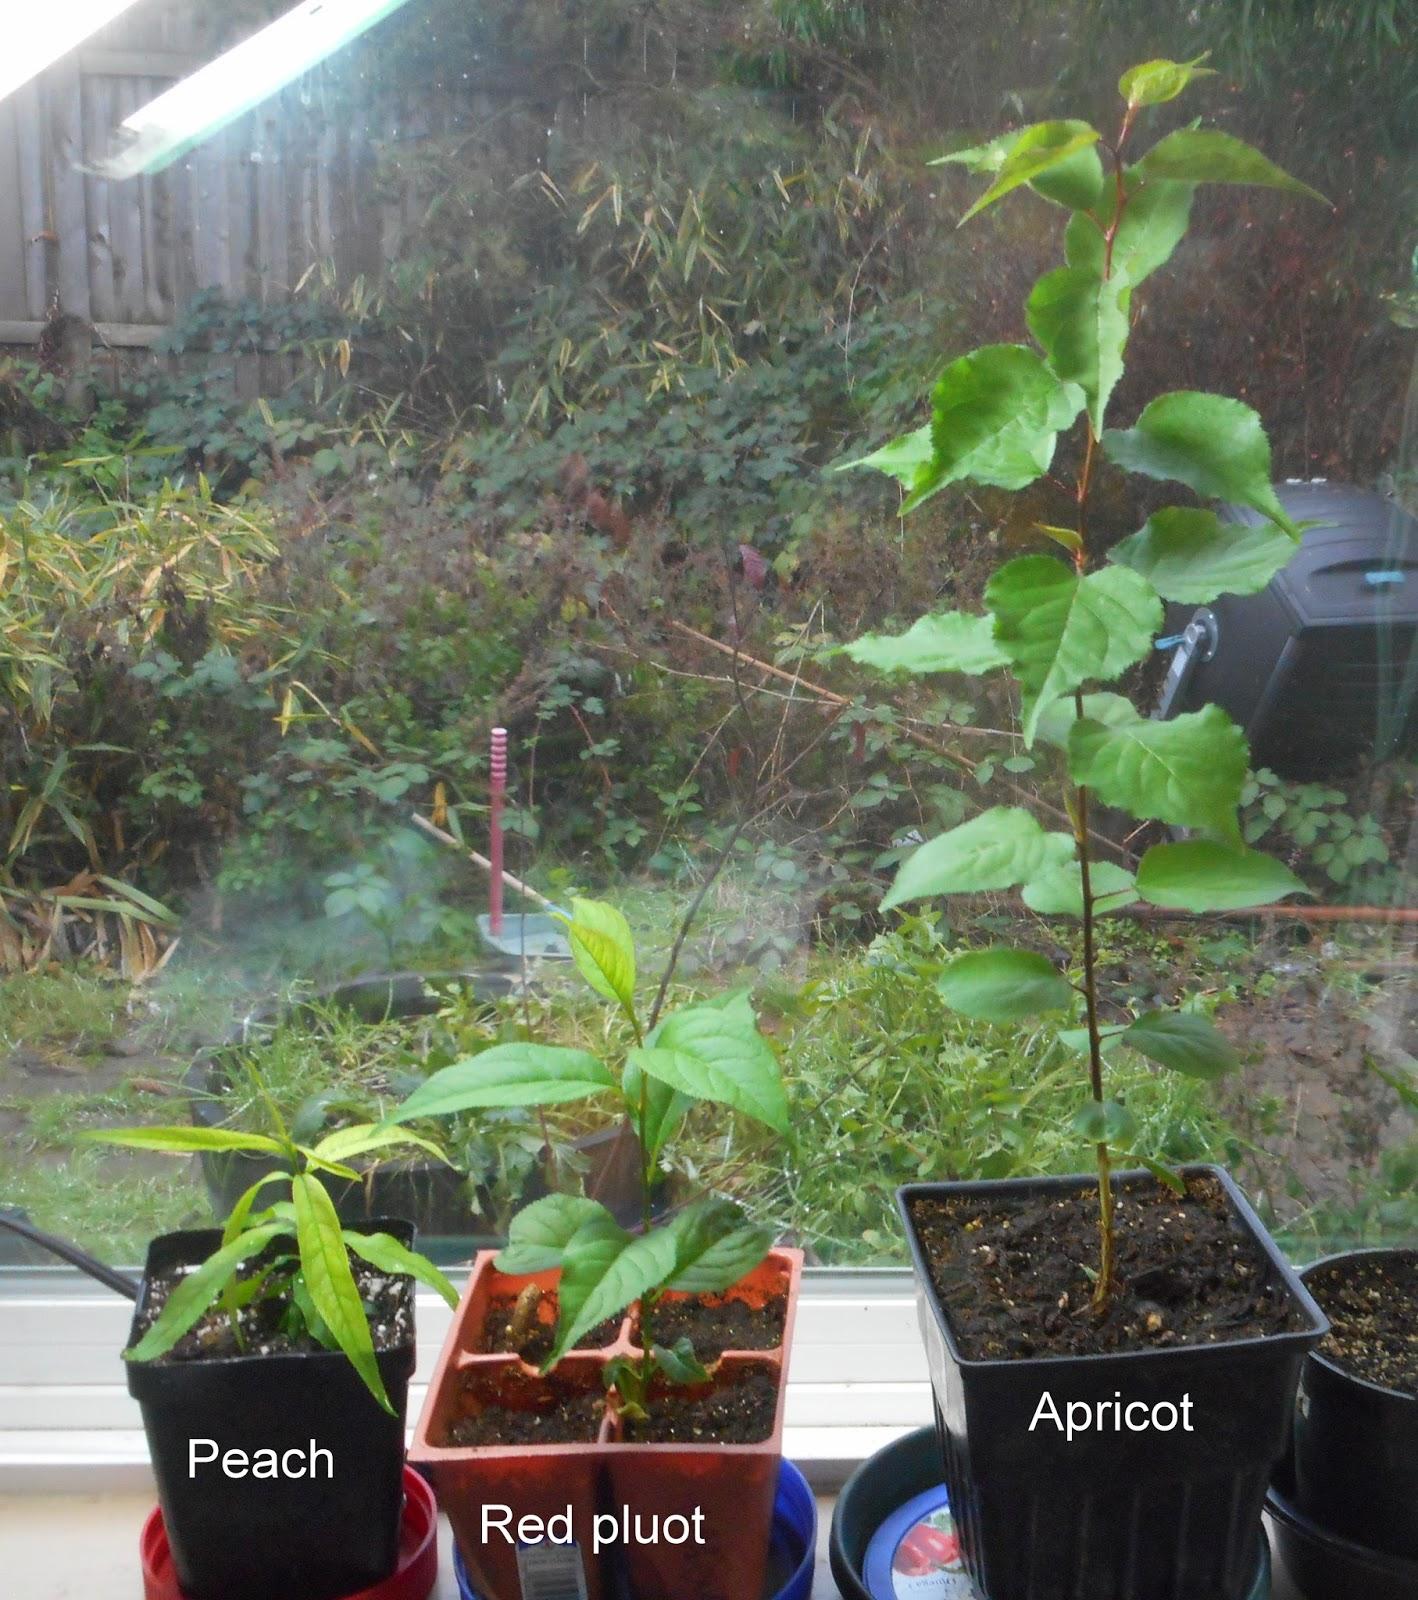 Apricot Seedling